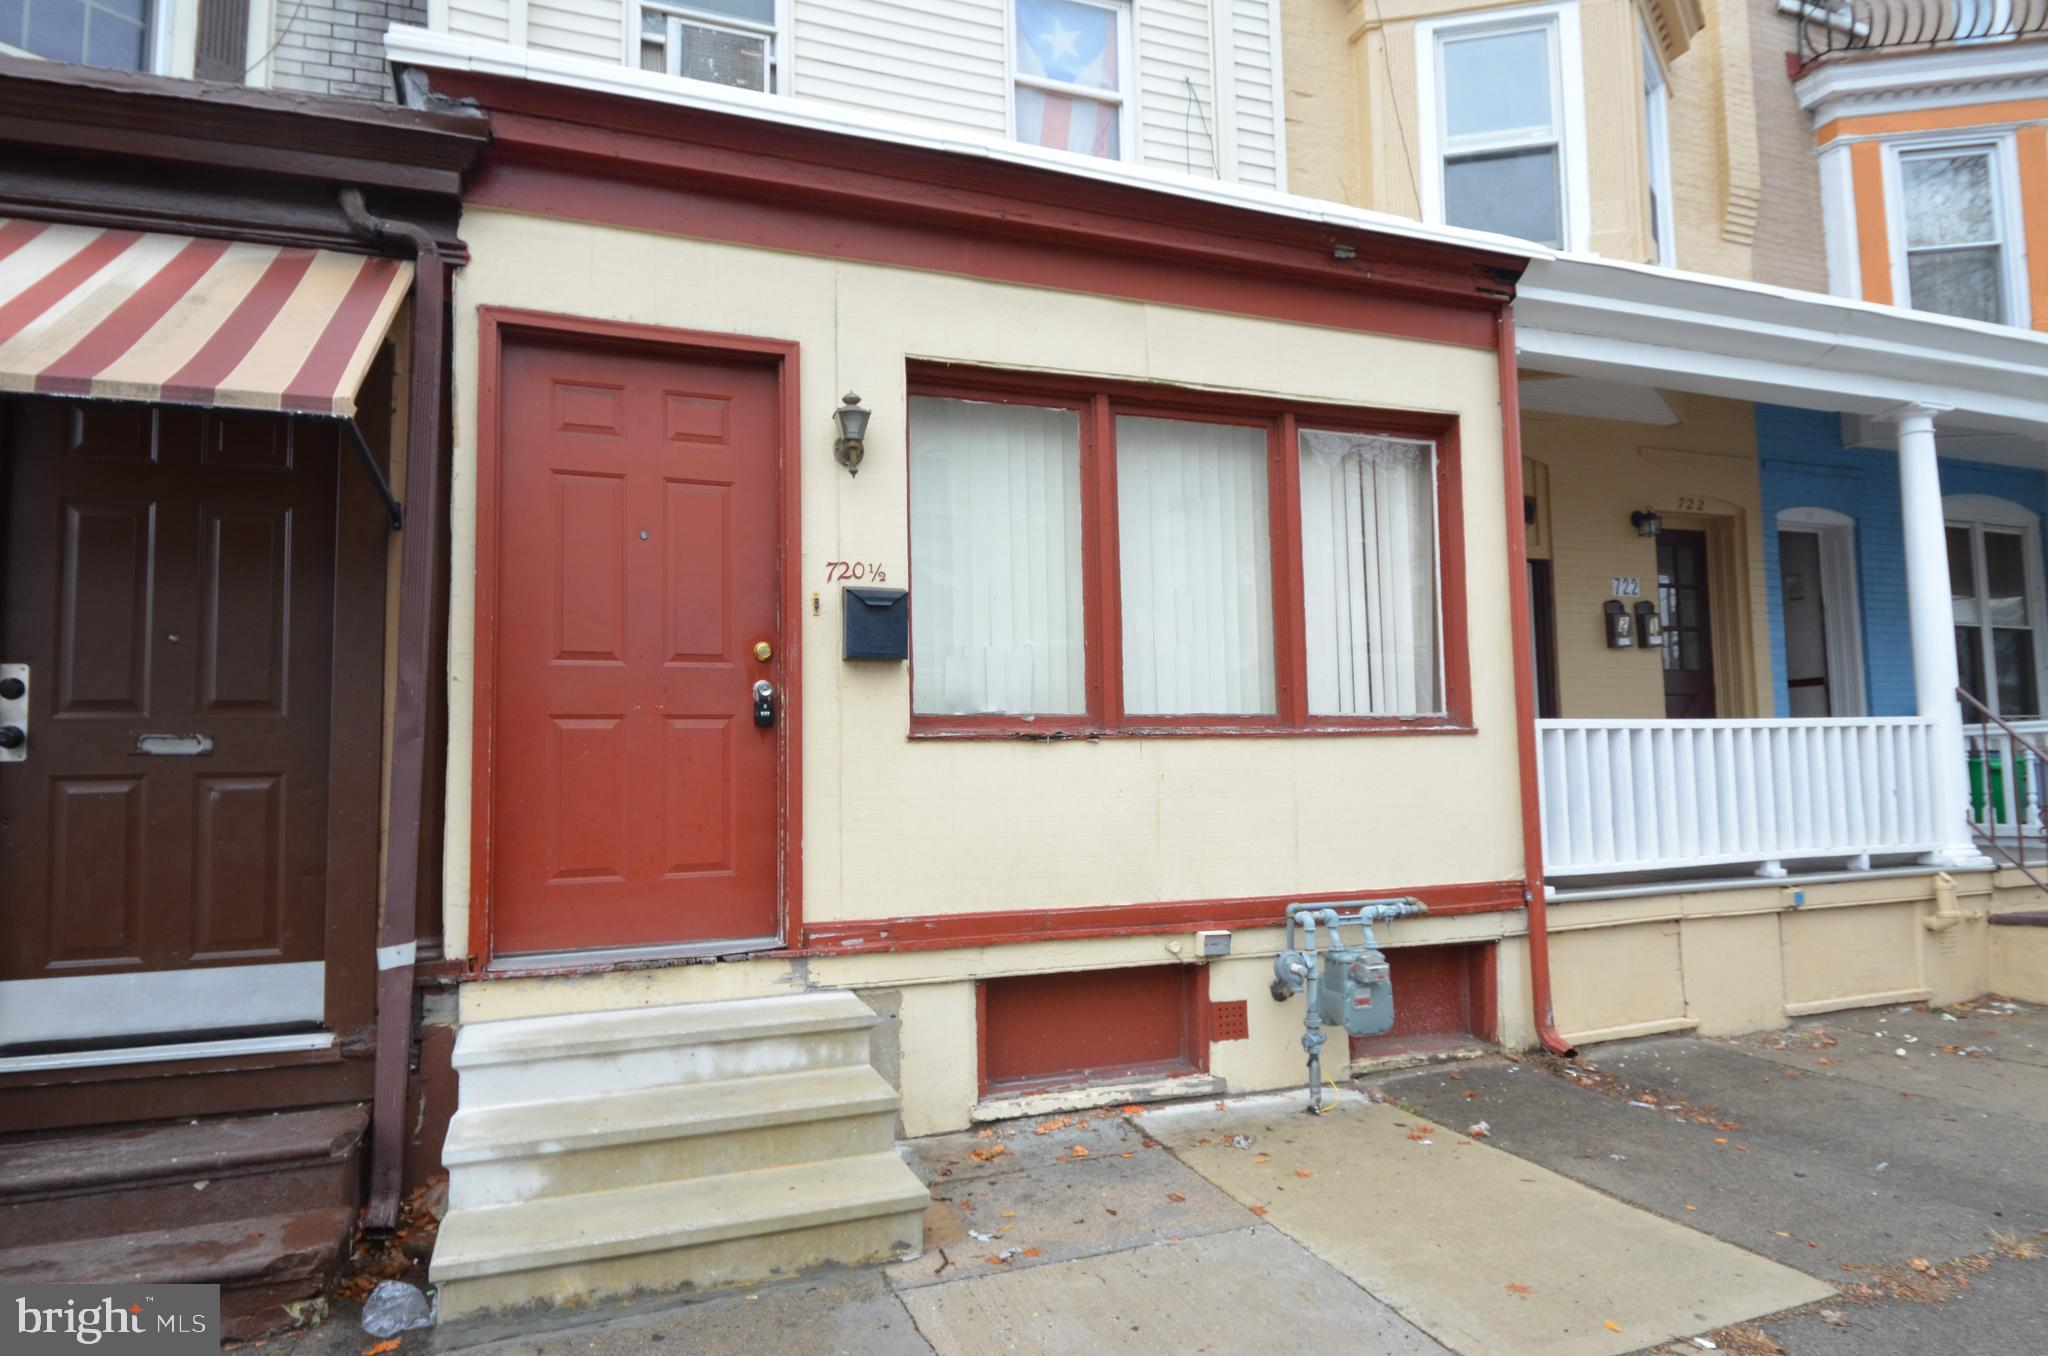 720 1/2 N 9TH STREET, ALLENTOWN, PA 18102